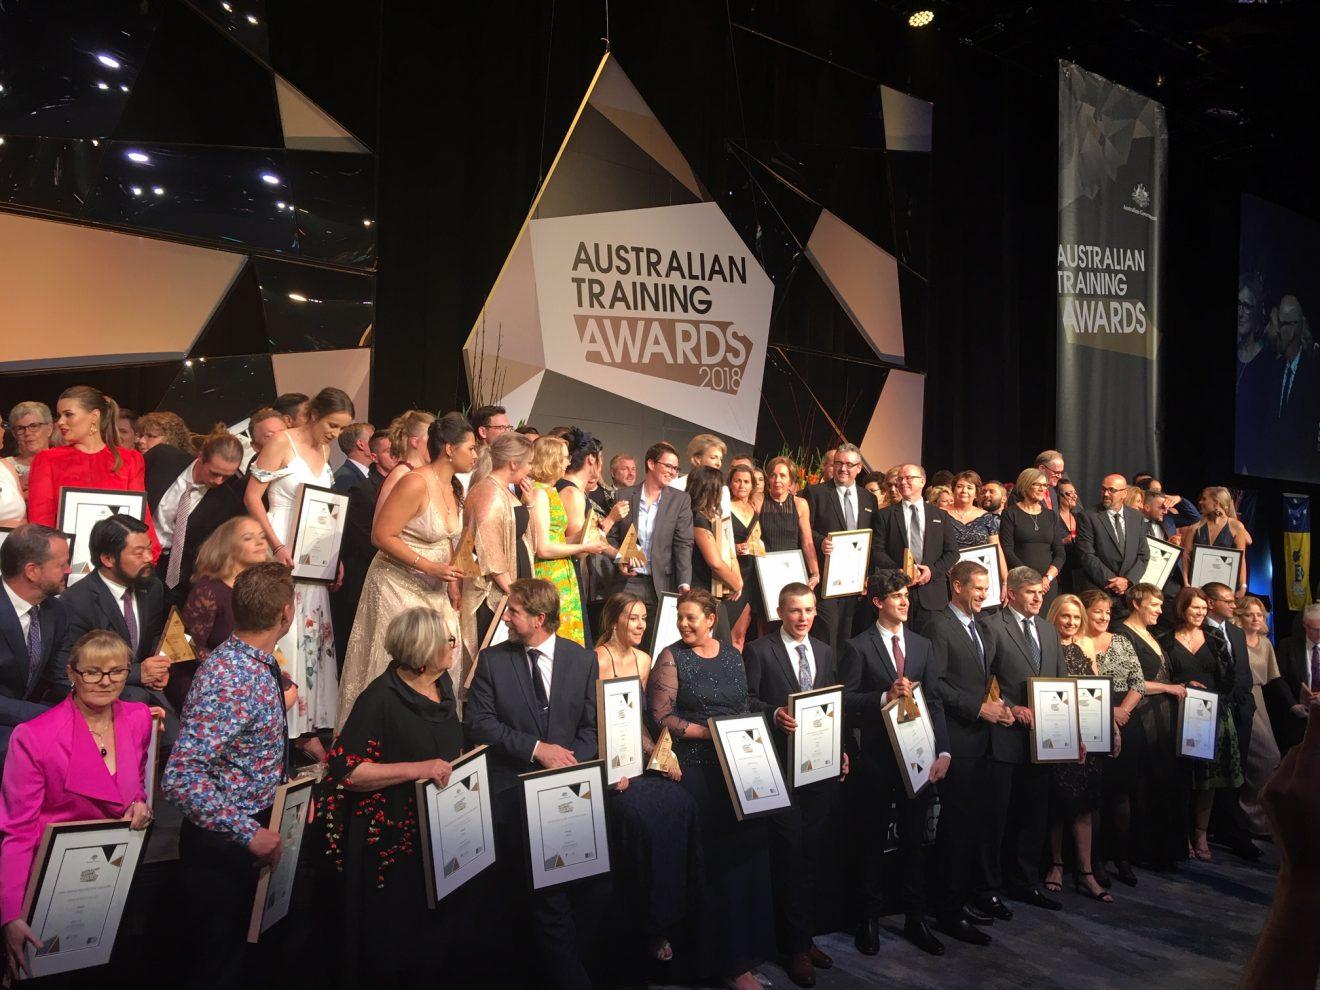 Australian Training Awards 2018